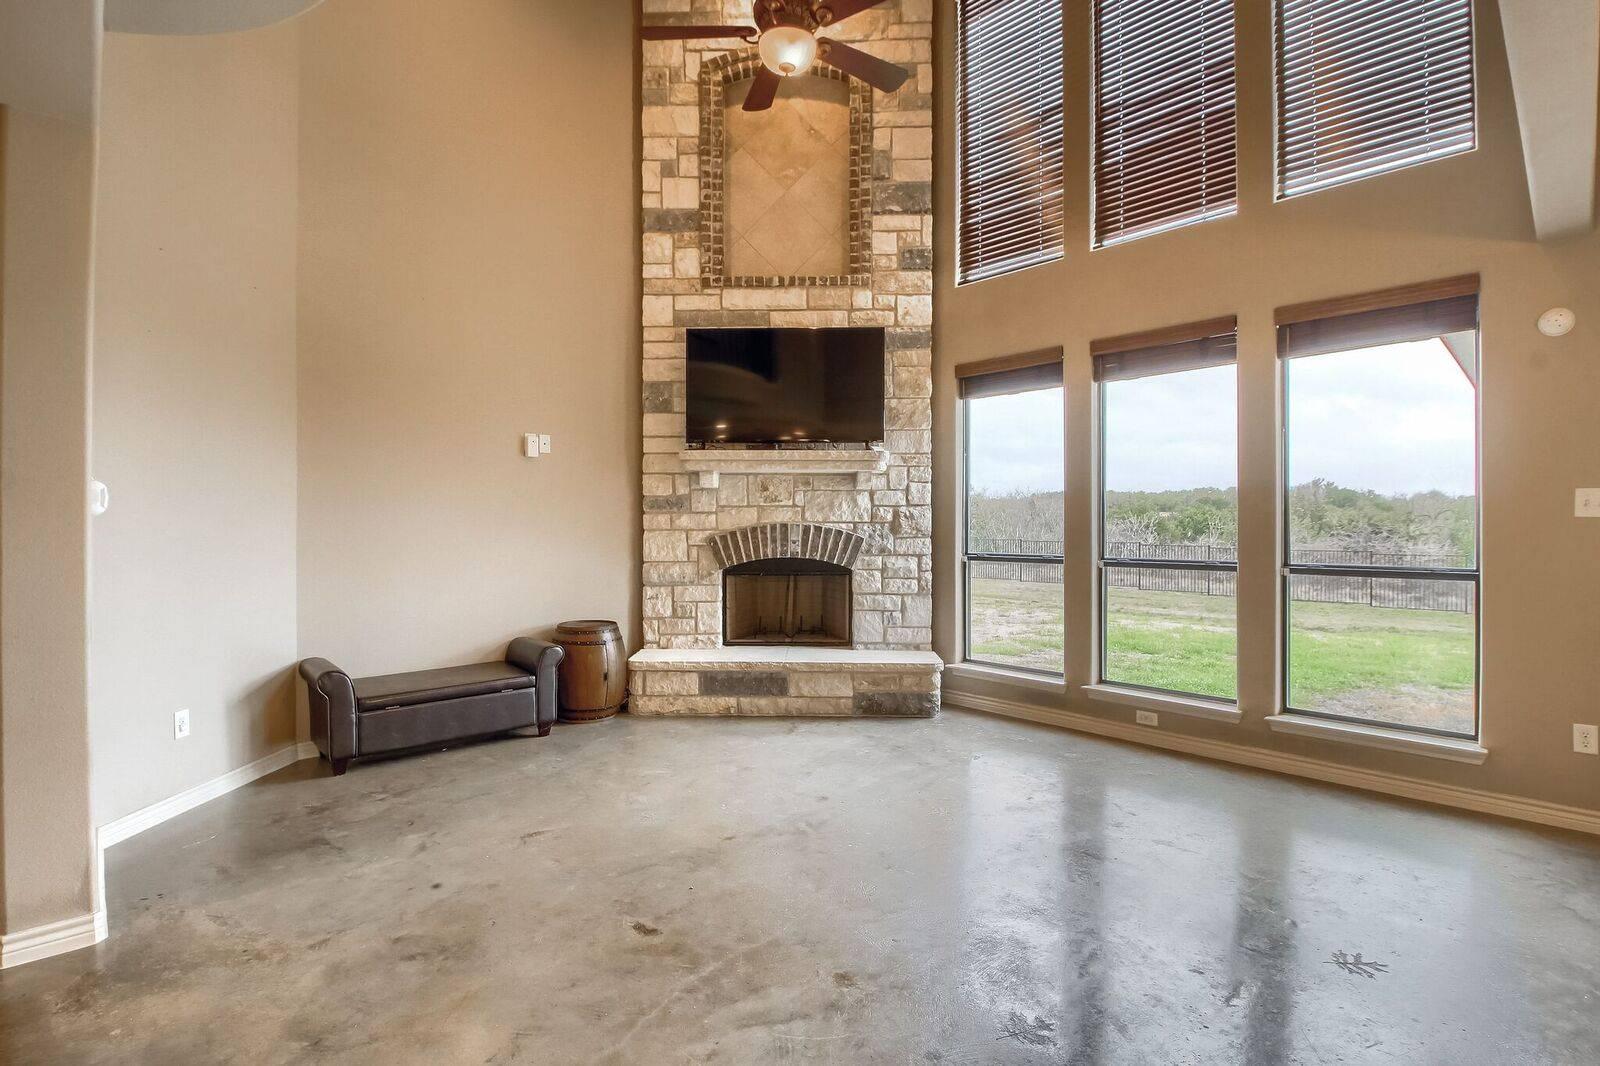 211 S. Sawgrass Lane Georgetown TX